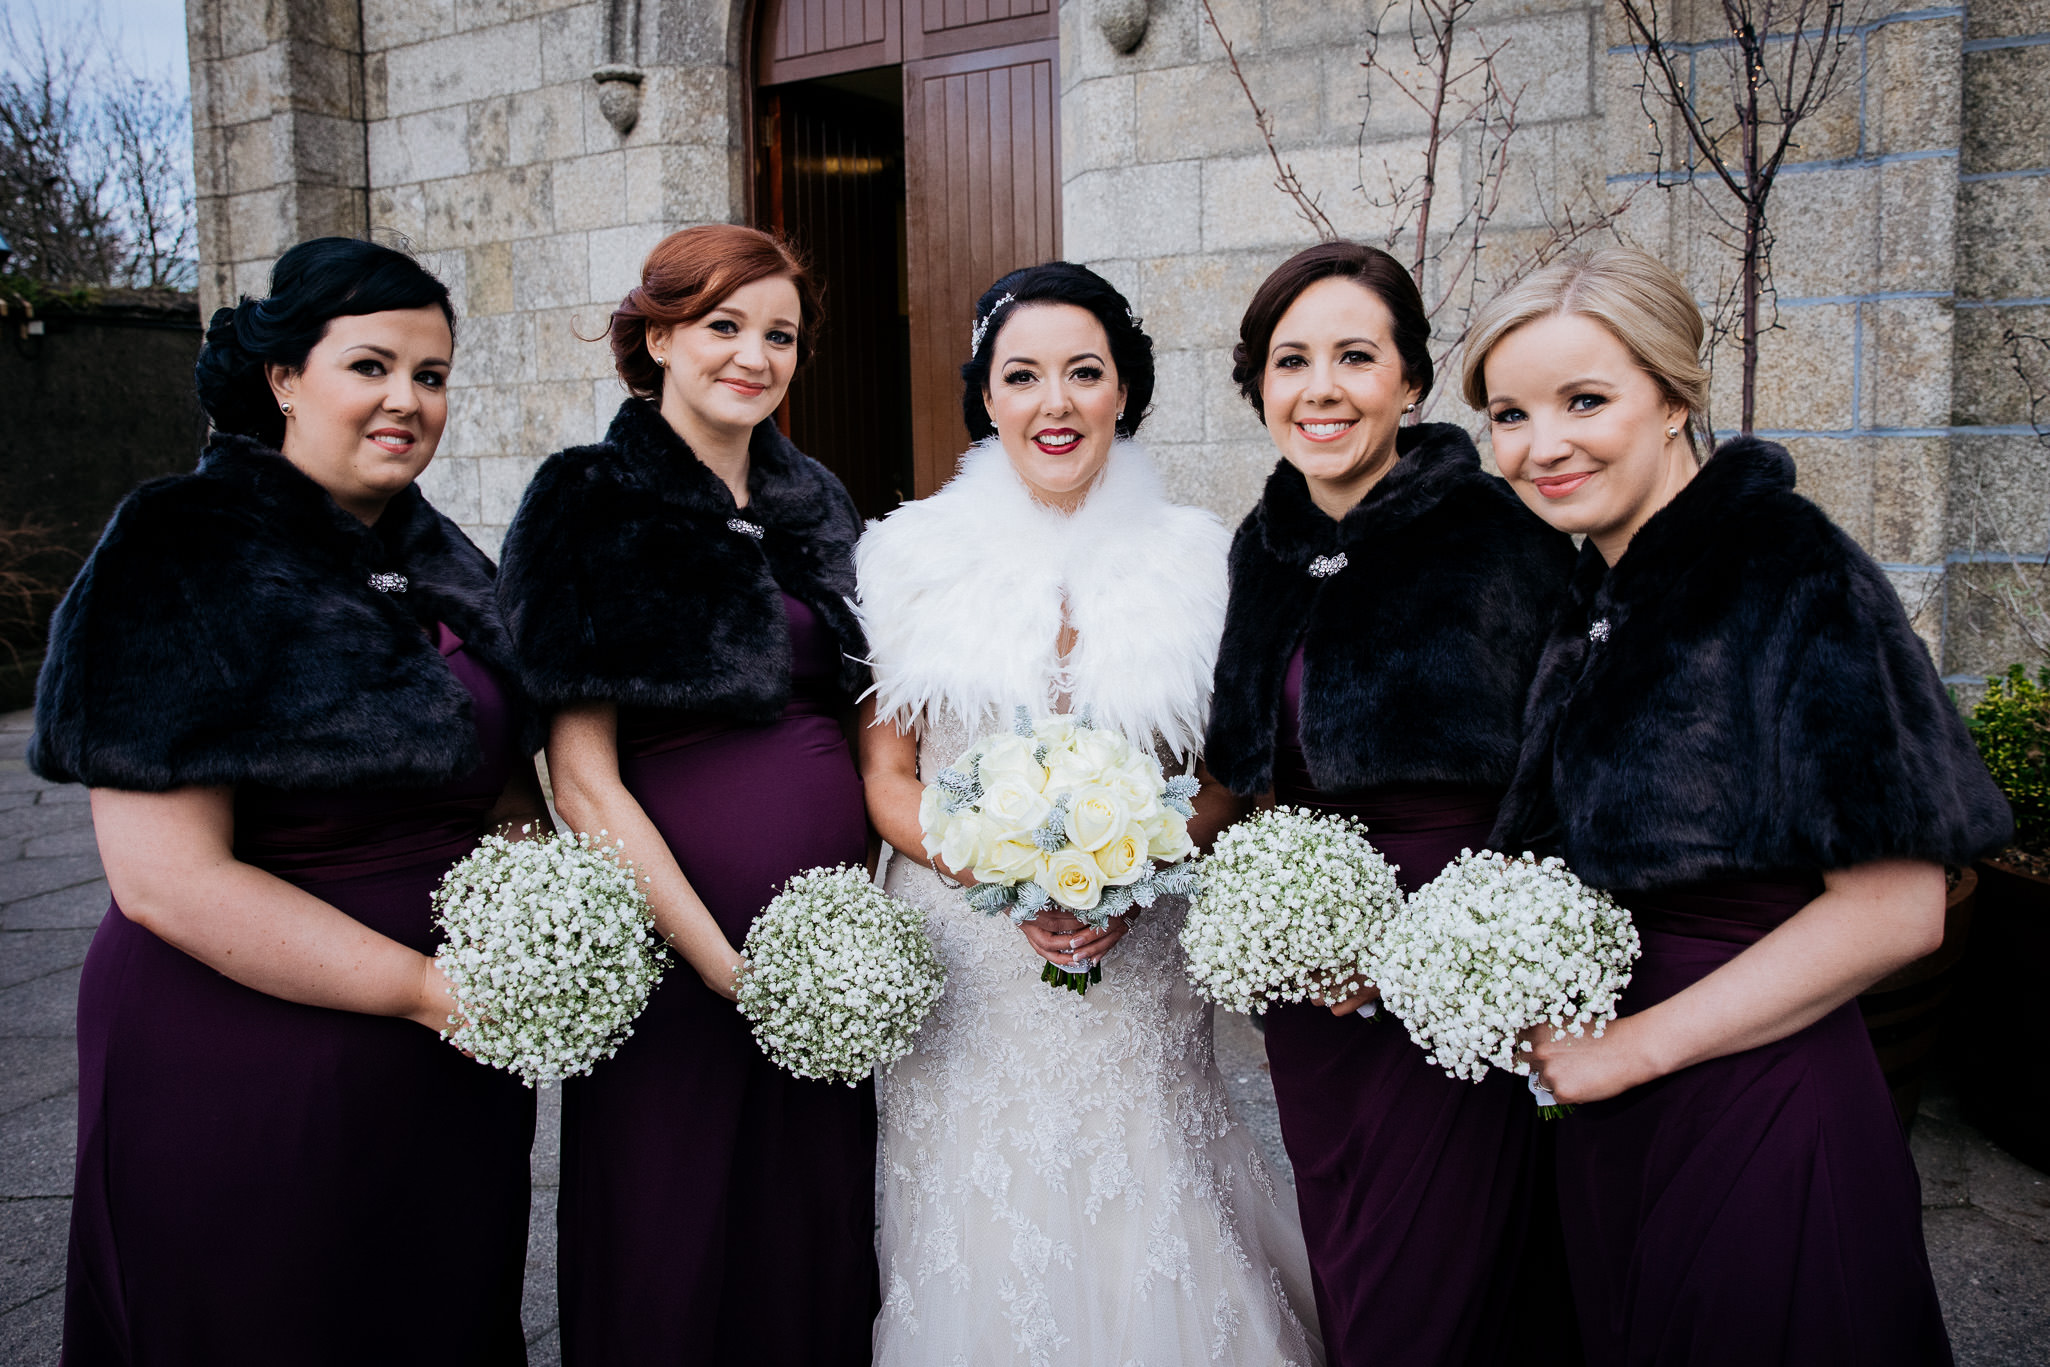 clairebyrnephotography-wedding-sparklers-christmas-orlagh-daithi-9.jpg